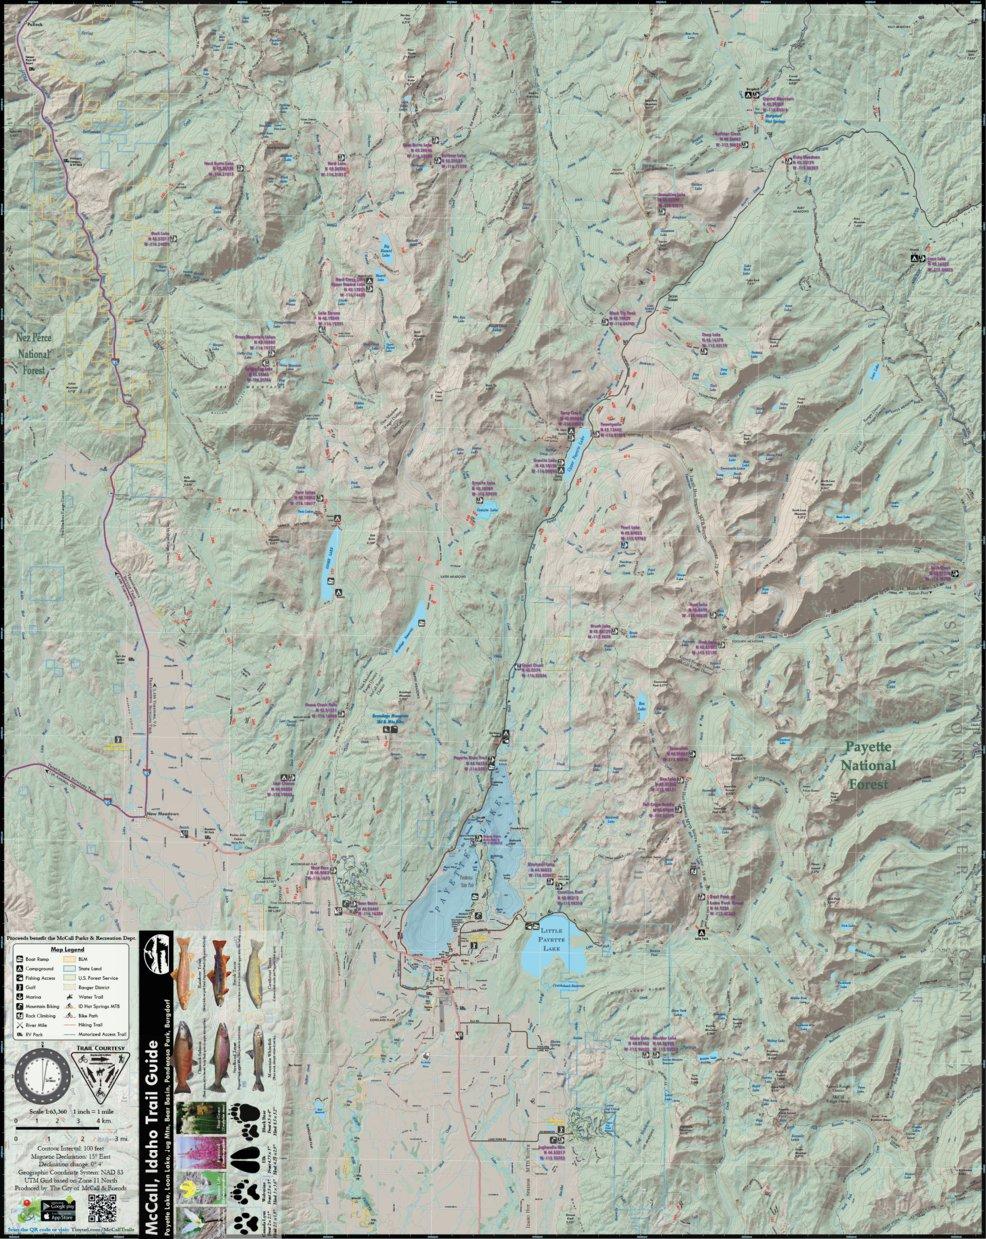 Mccall Idaho Trail Guide Free City Of Mccall Avenza Maps